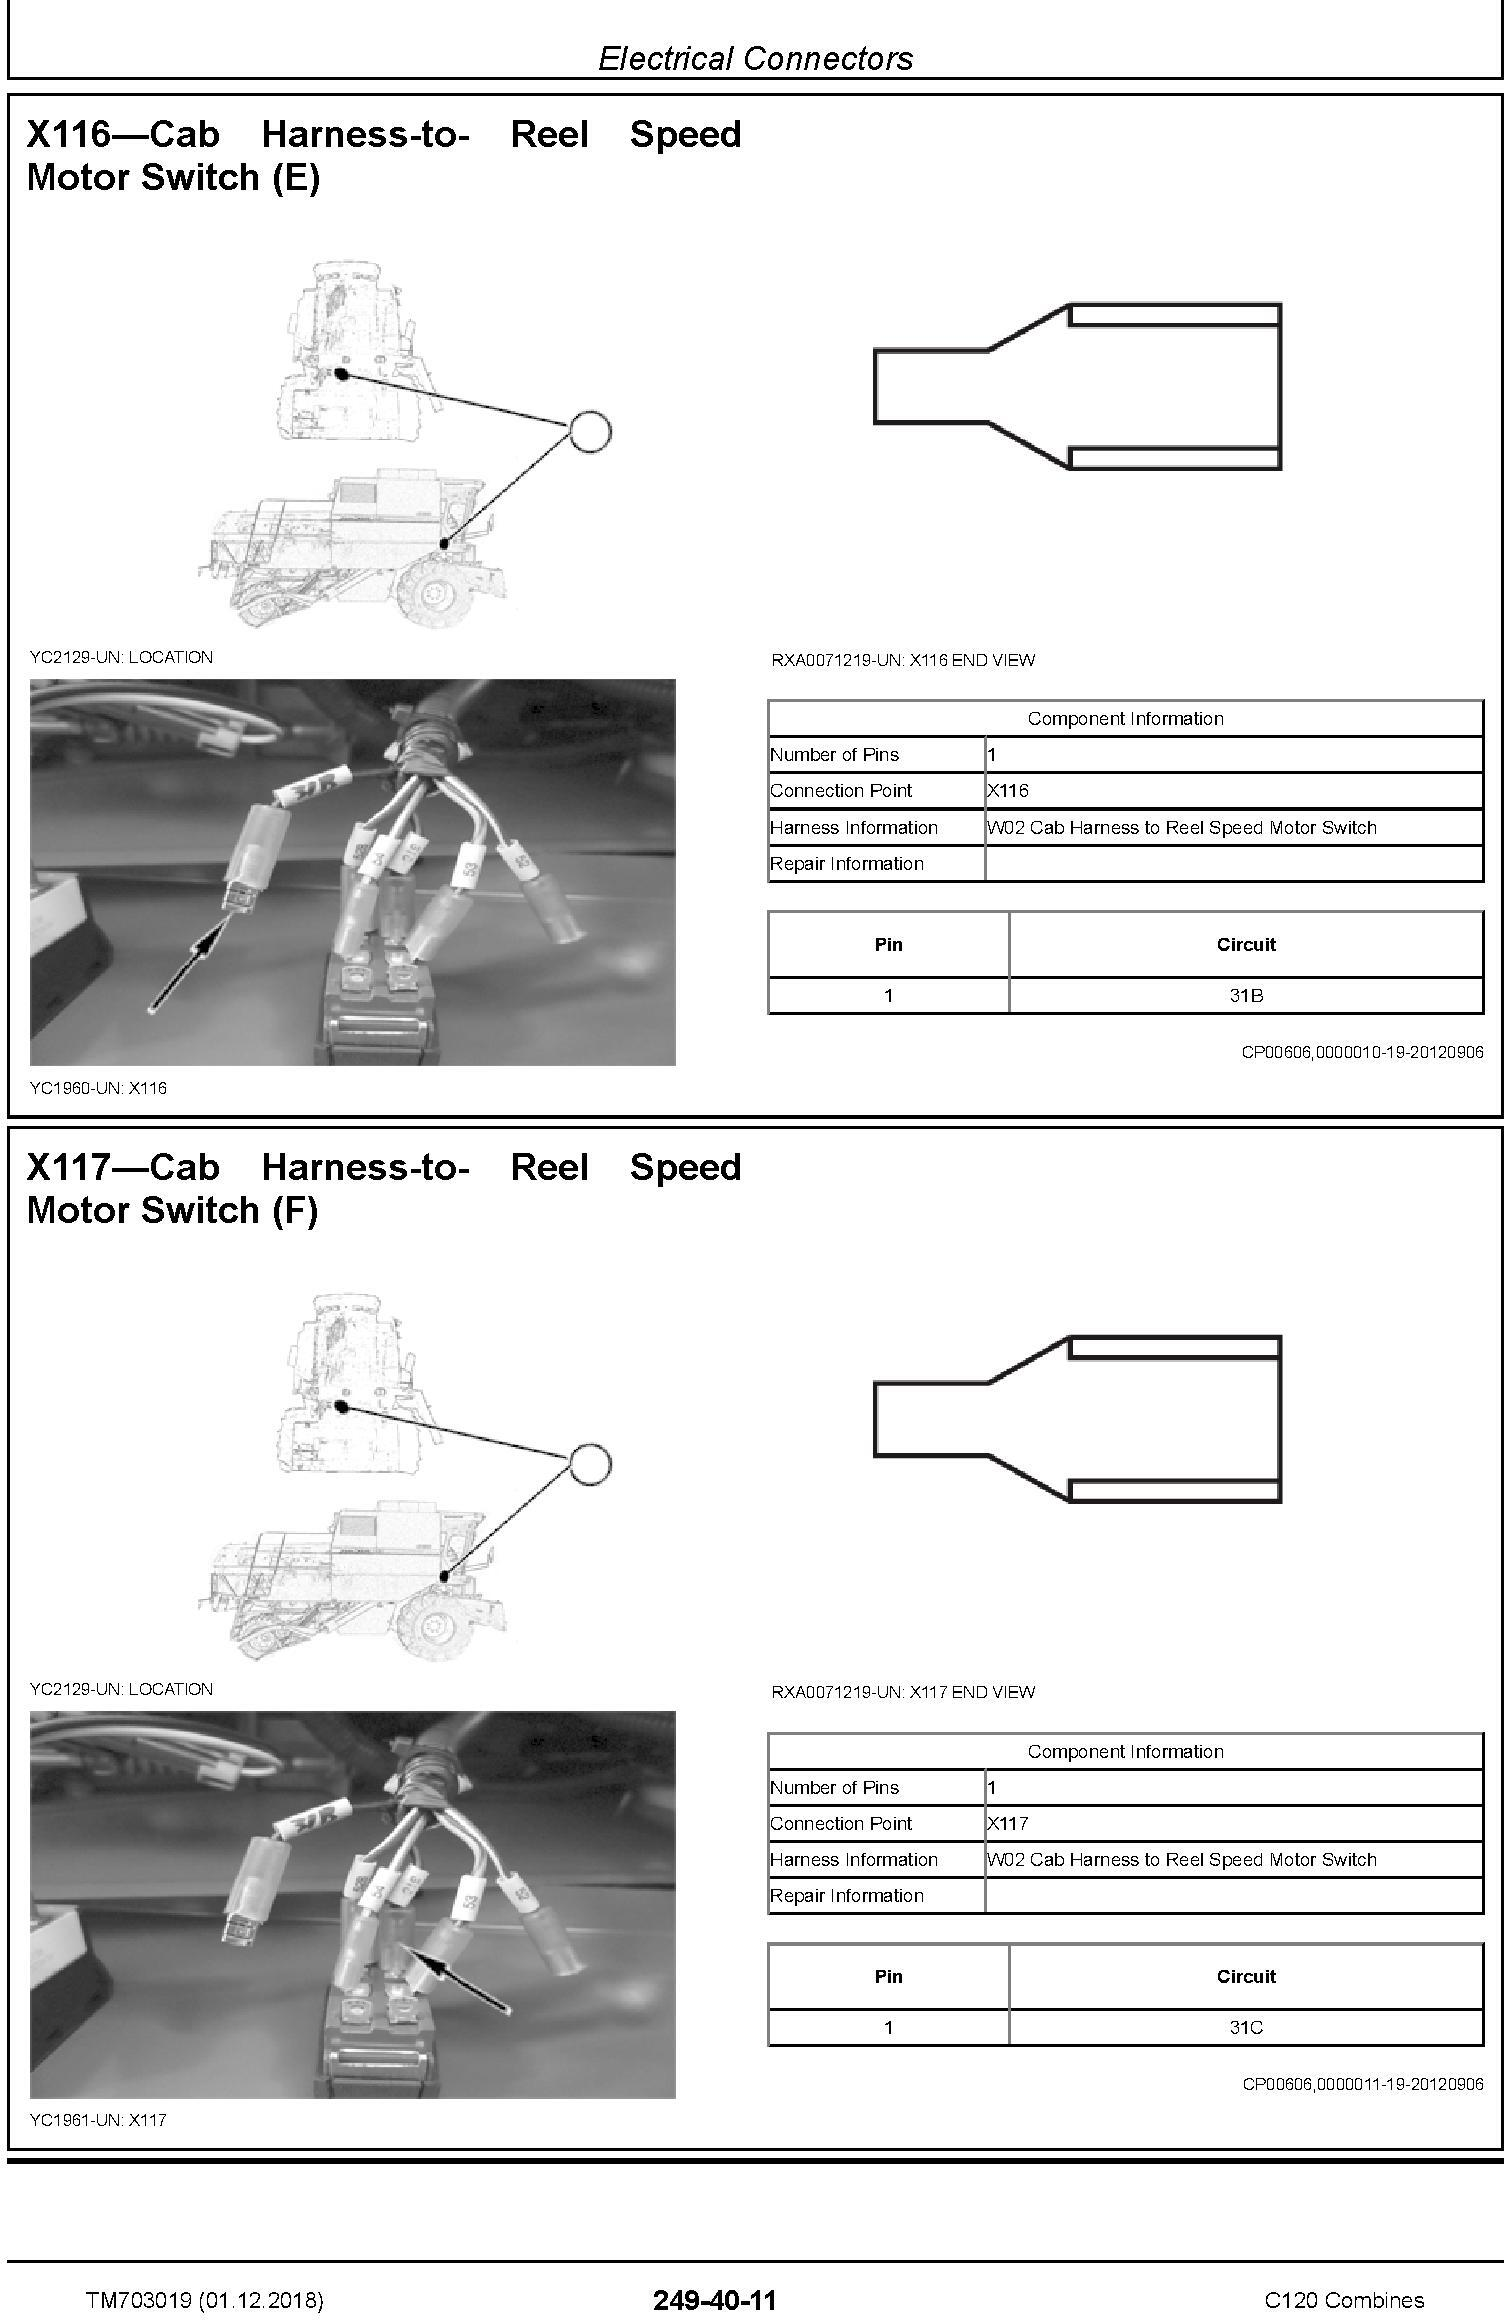 John Deere C120 Combines (Asian Edition) Technical Service Manual (TM703019) - 3